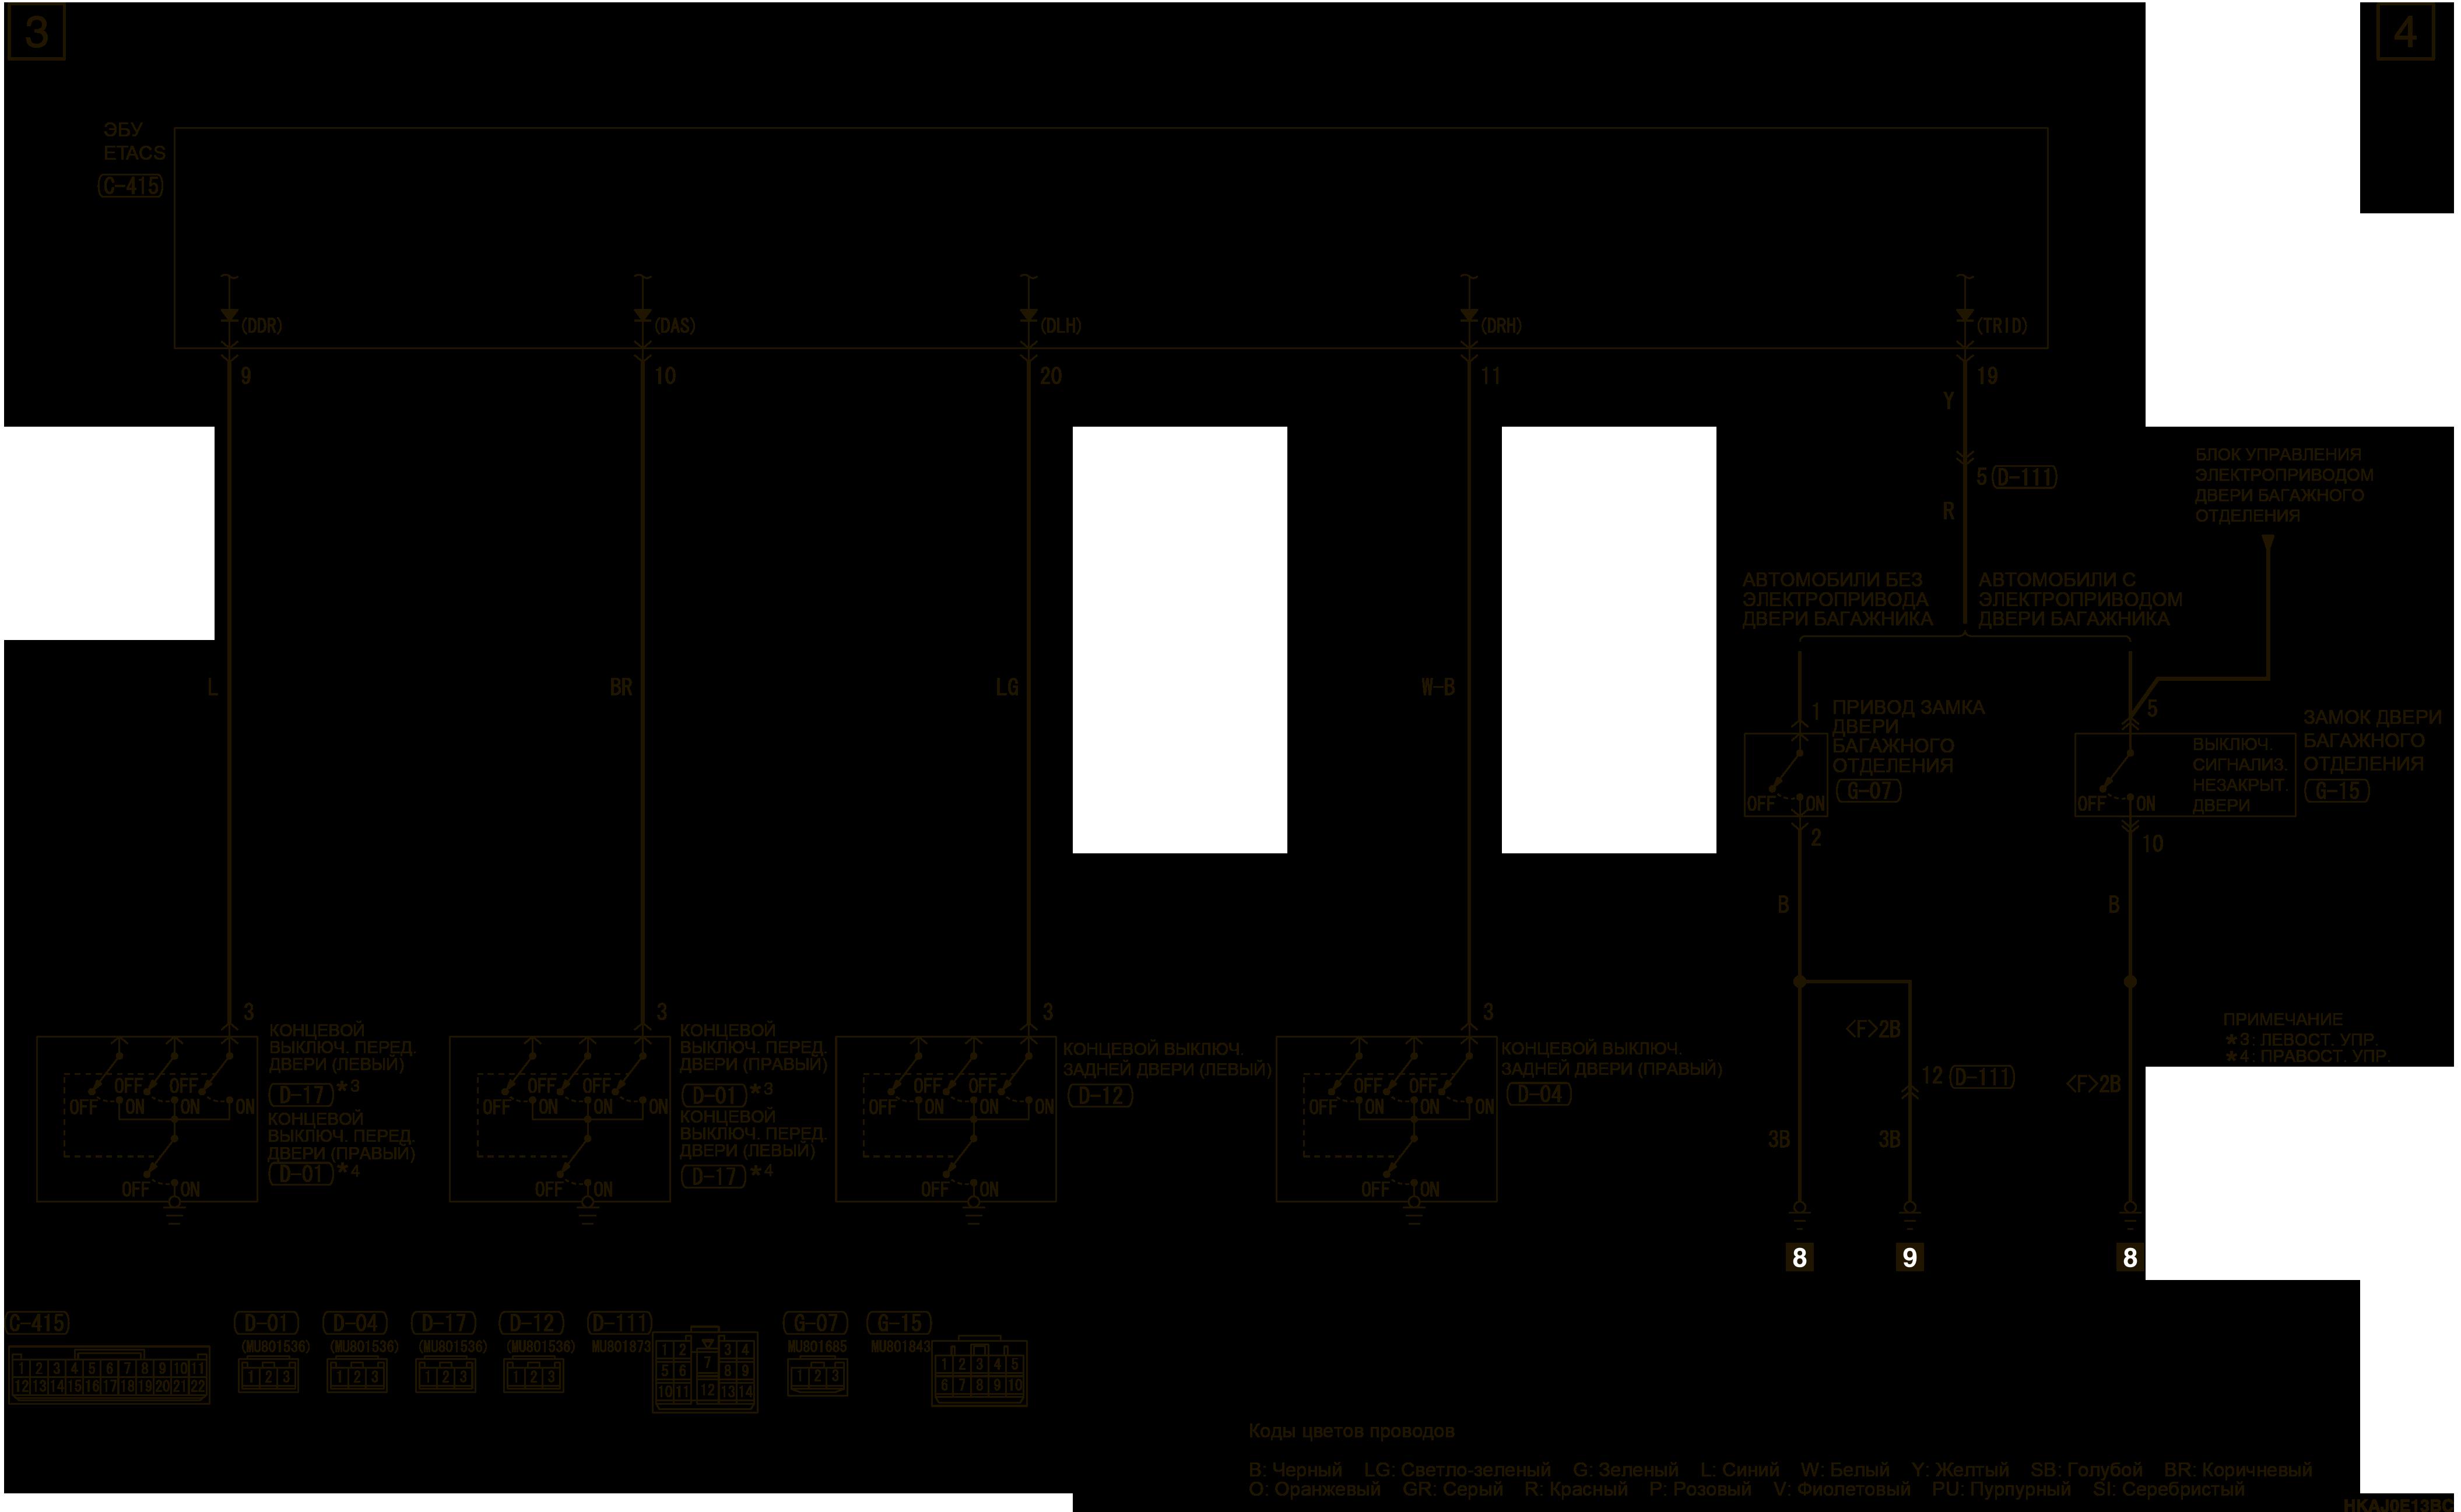 mmc аутлендер 3 2019 электросхемаПЛАФОН ОСВЕЩЕНИЯ САЛОНА, ПЛАФОН ОСВЕЩЕНИЯ БАГАЖНОГО ОТДЕЛЕНИЯ И ЛАМПА ПОДСВЕТКИ ЦИЛИНДРА КЛЮЧА ЗАЖИГАНИЯ